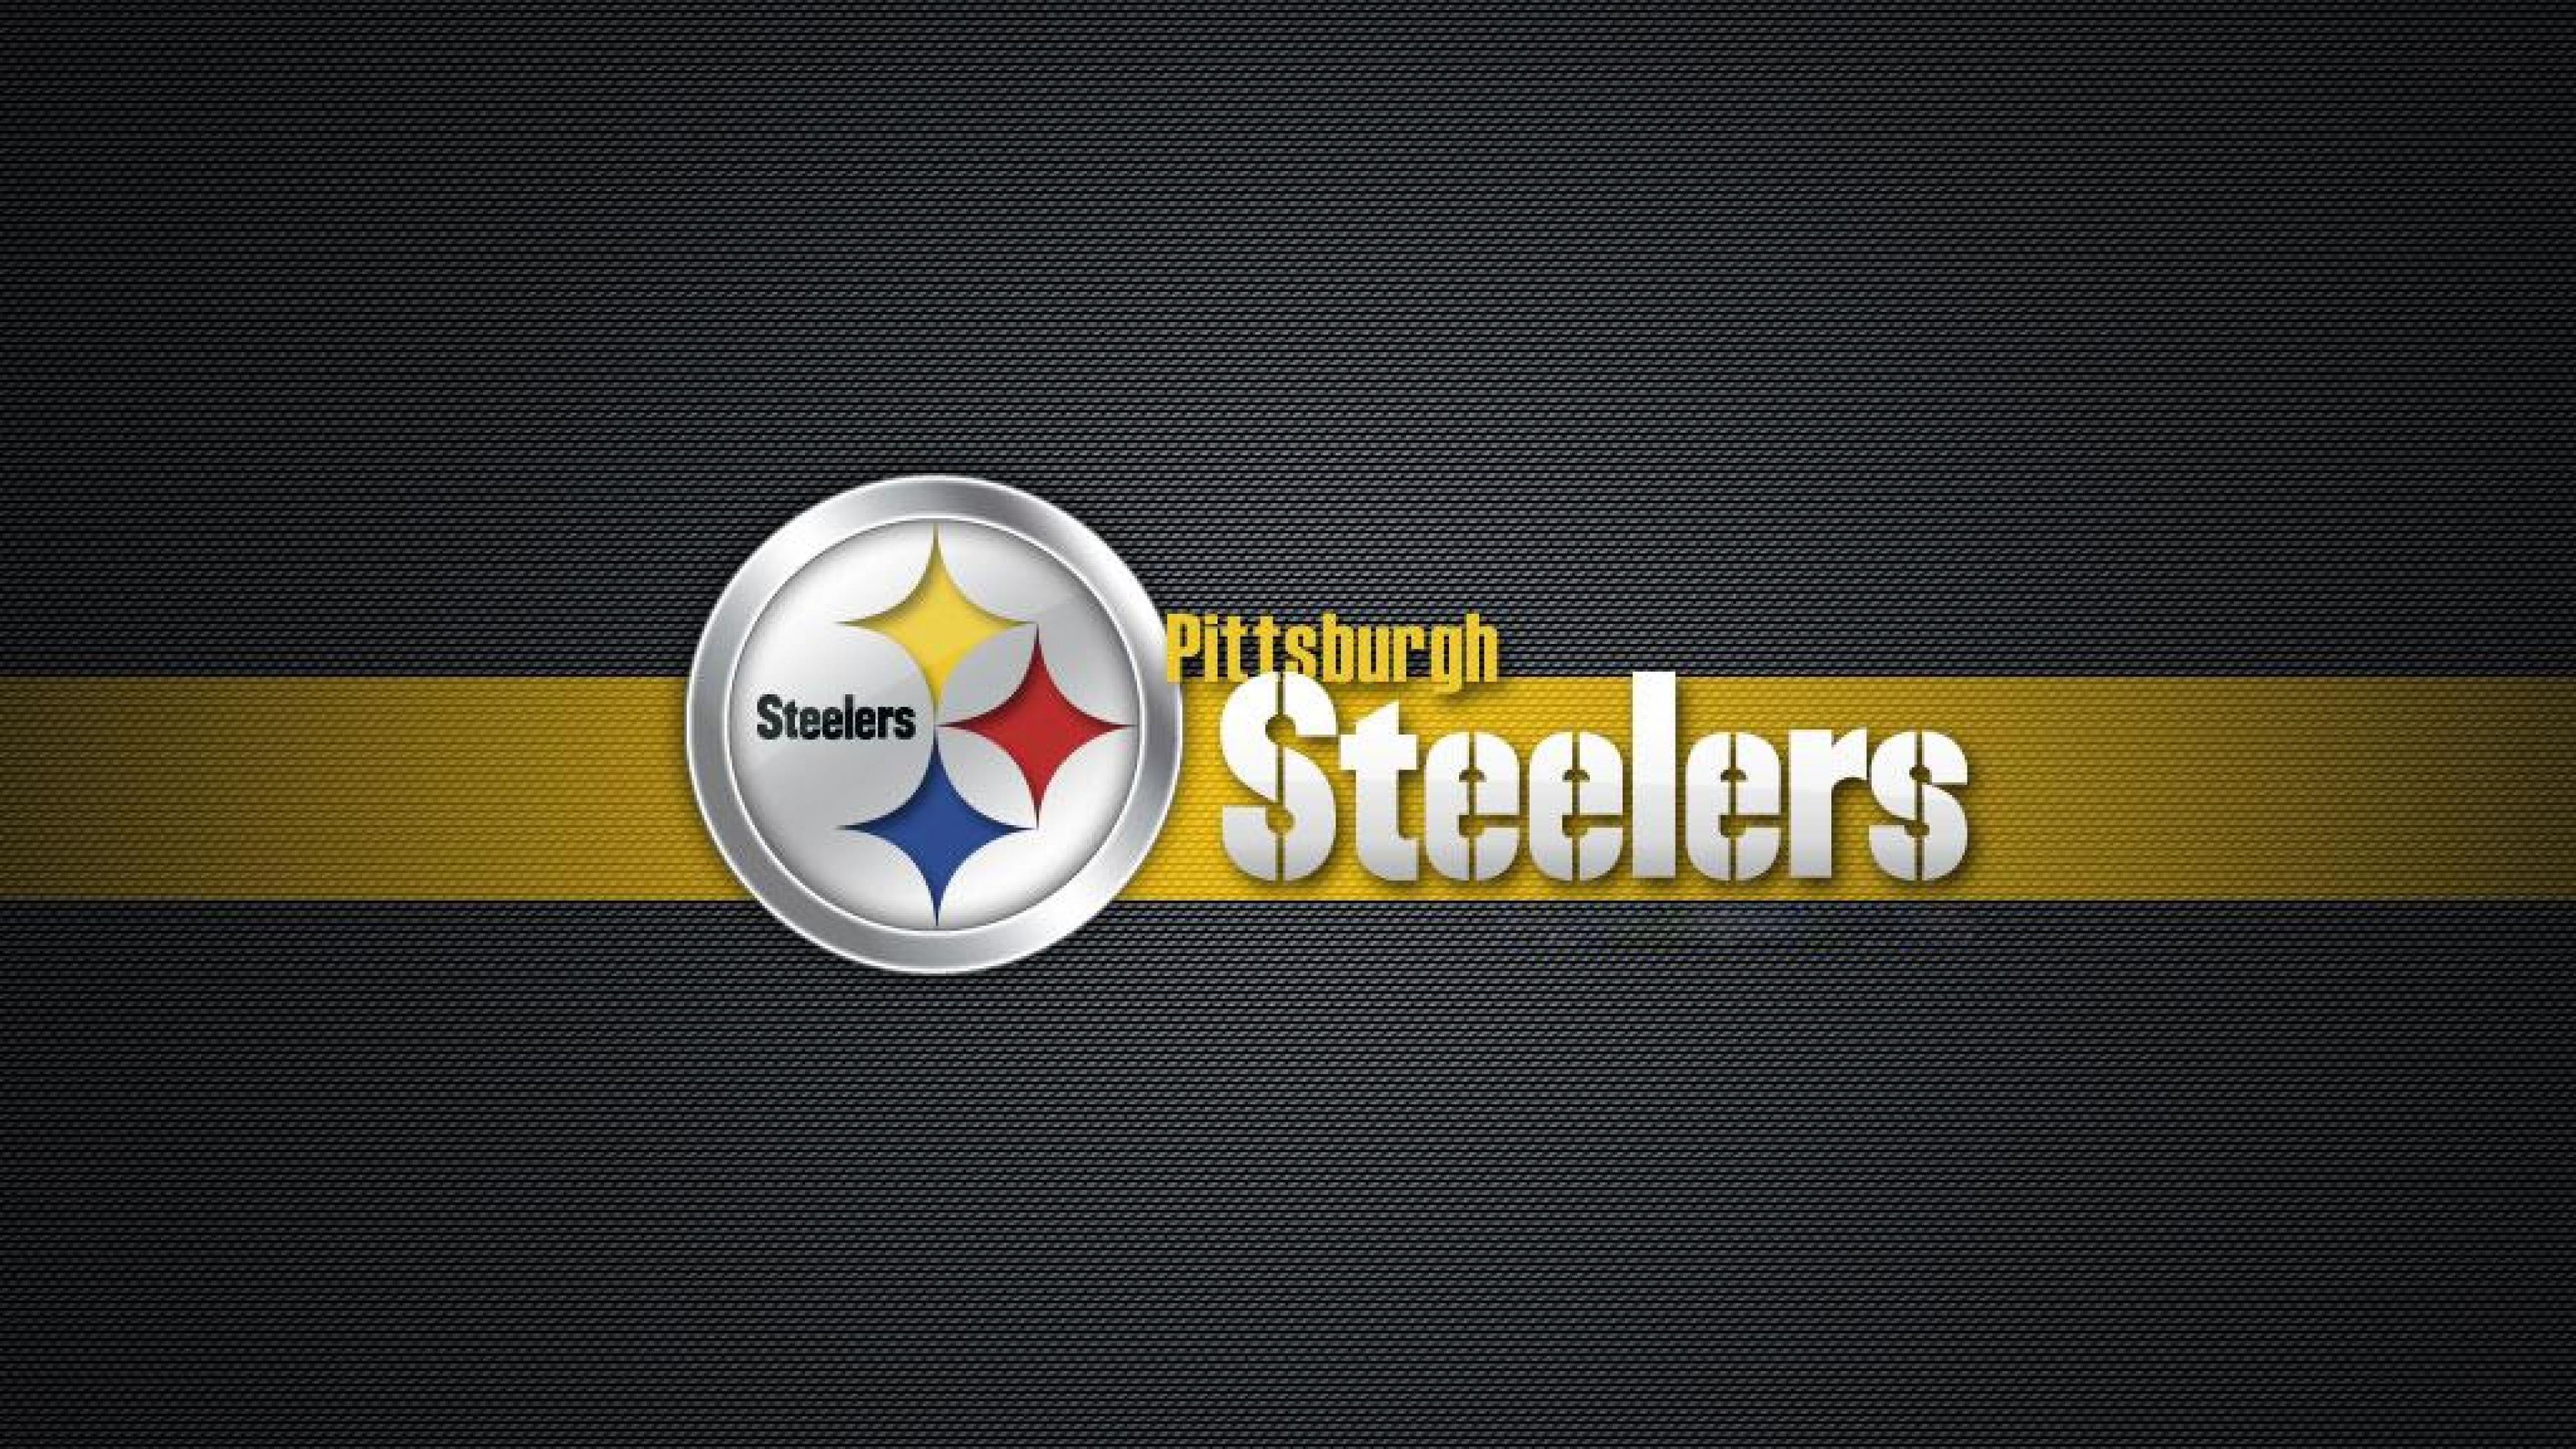 Title Sport Pittsburgh Steelers Logo Wallpaper Hd Wallpaperwiki Dimension 3840 X 2160 File Type JPG JPEG